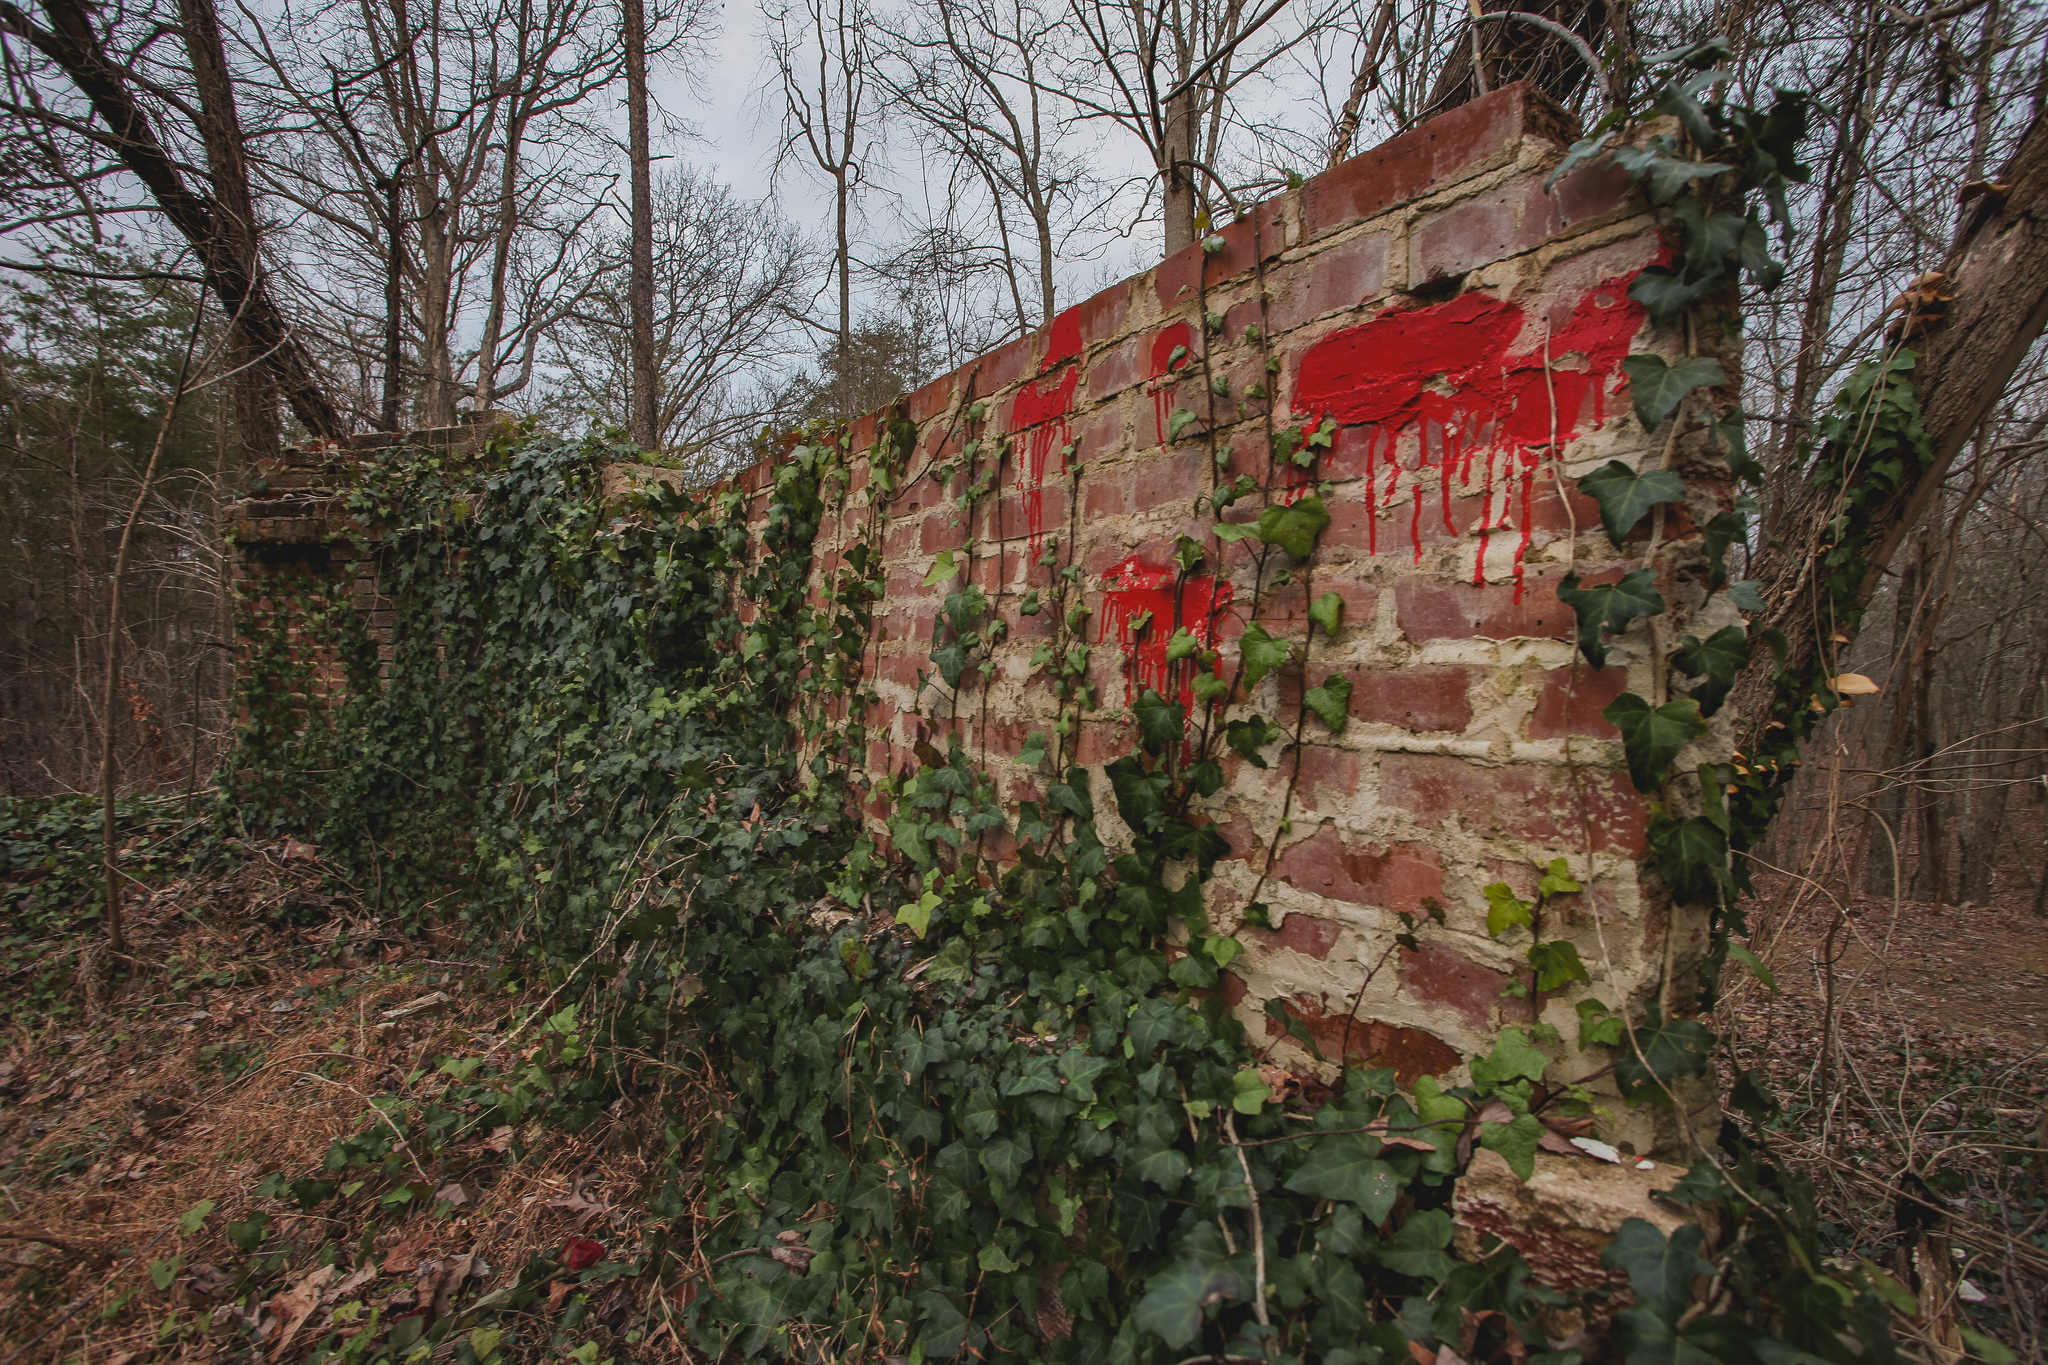 Corpsewood Manor